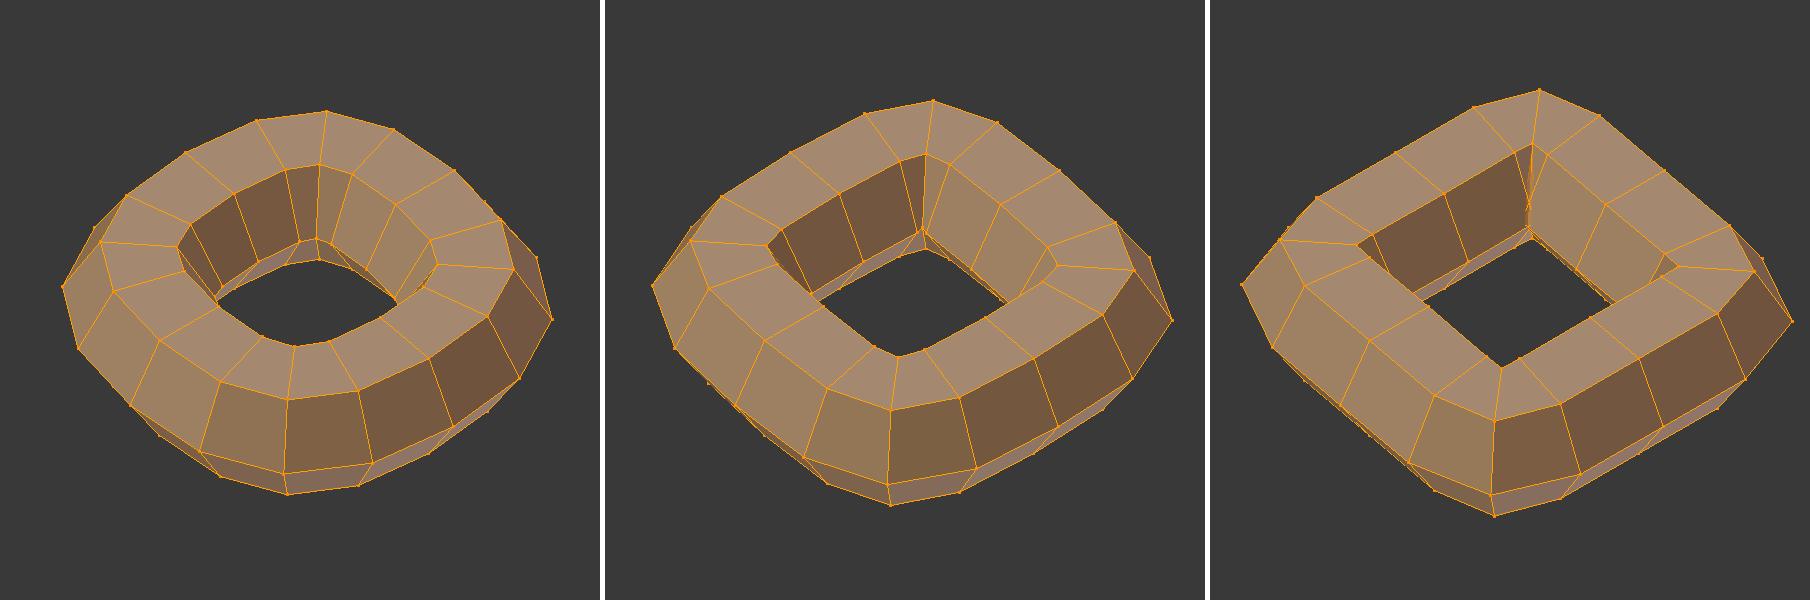 bridge-edge-loops-smoothness